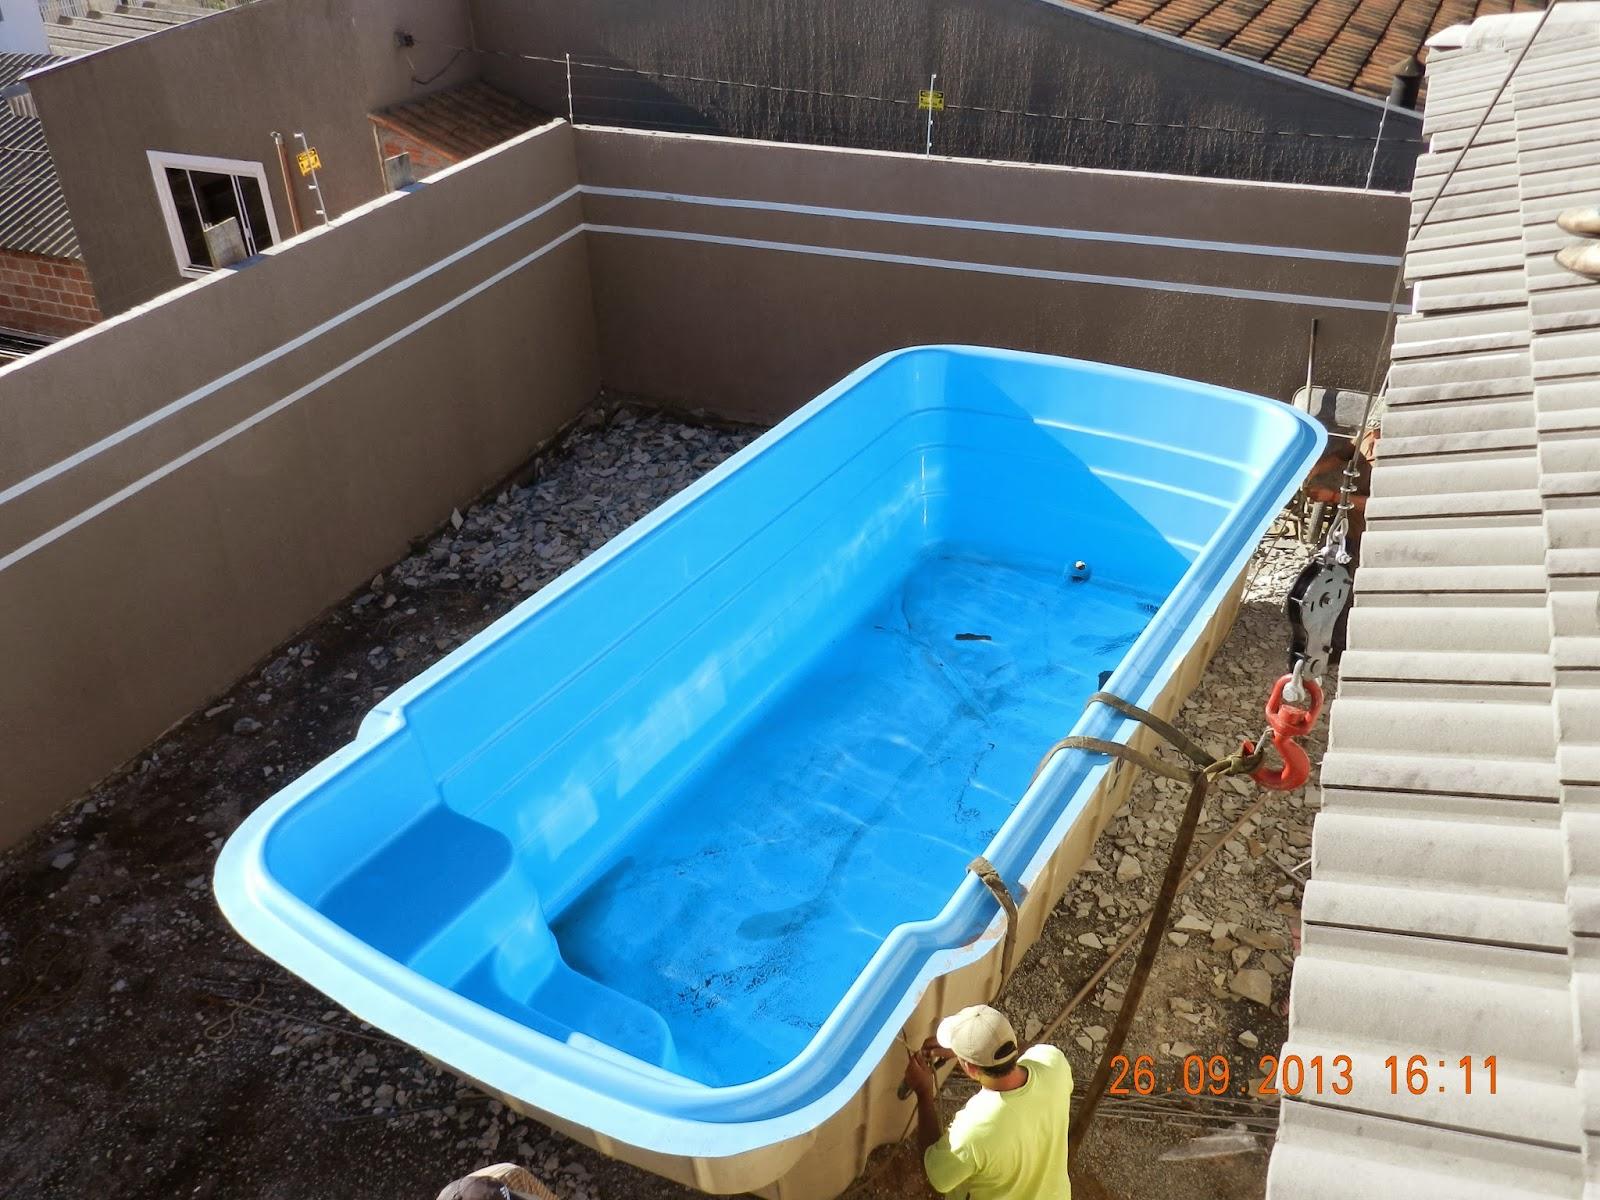 Casa da gloria demoli o da fachada chegada da piscina for Piscina java